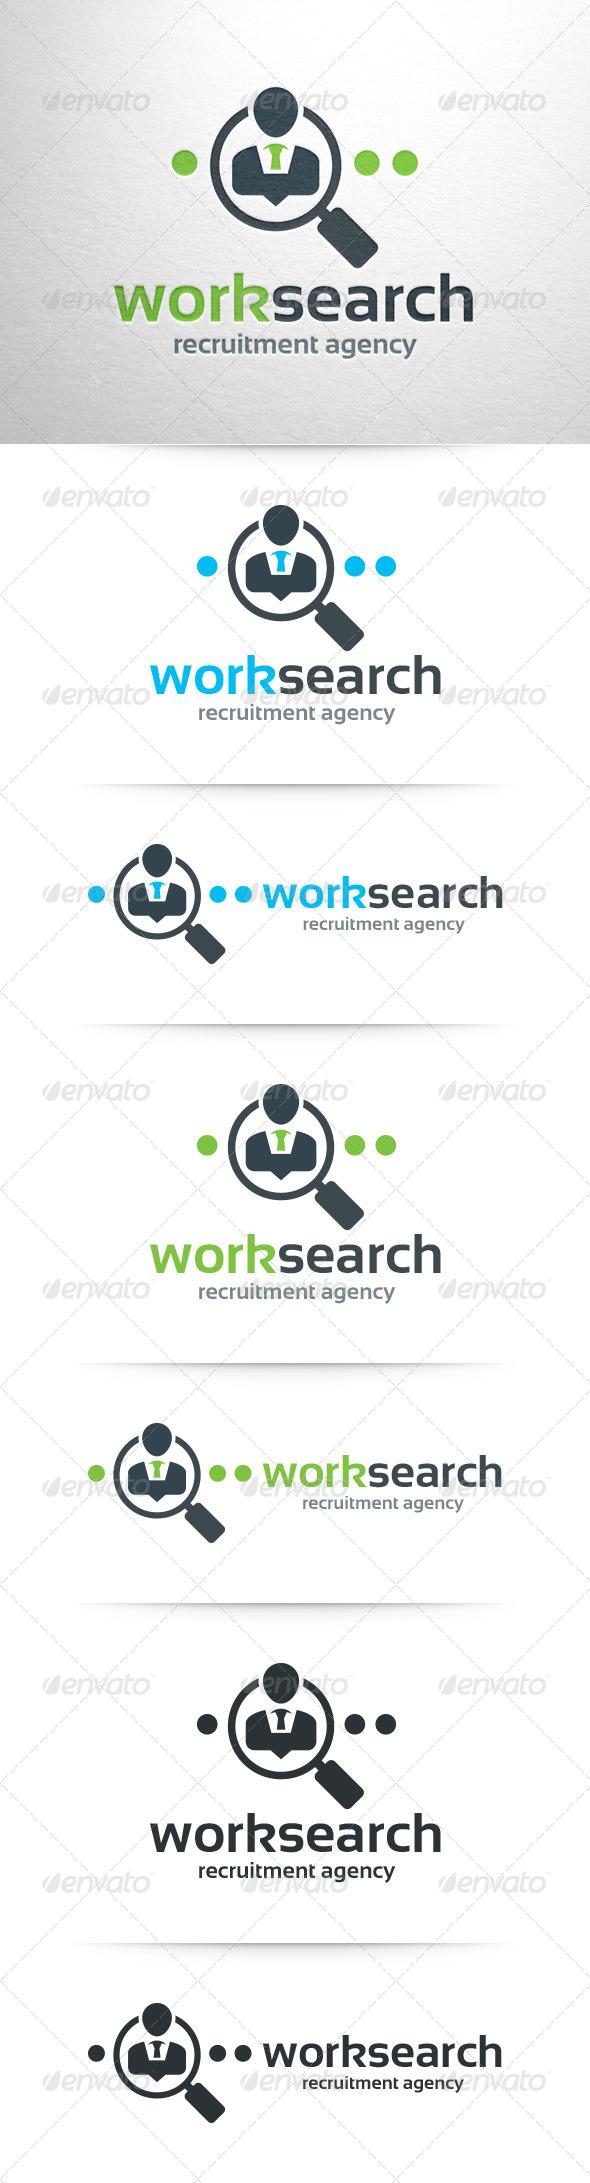 GraphicRiver Work Search Logo Template 7962188